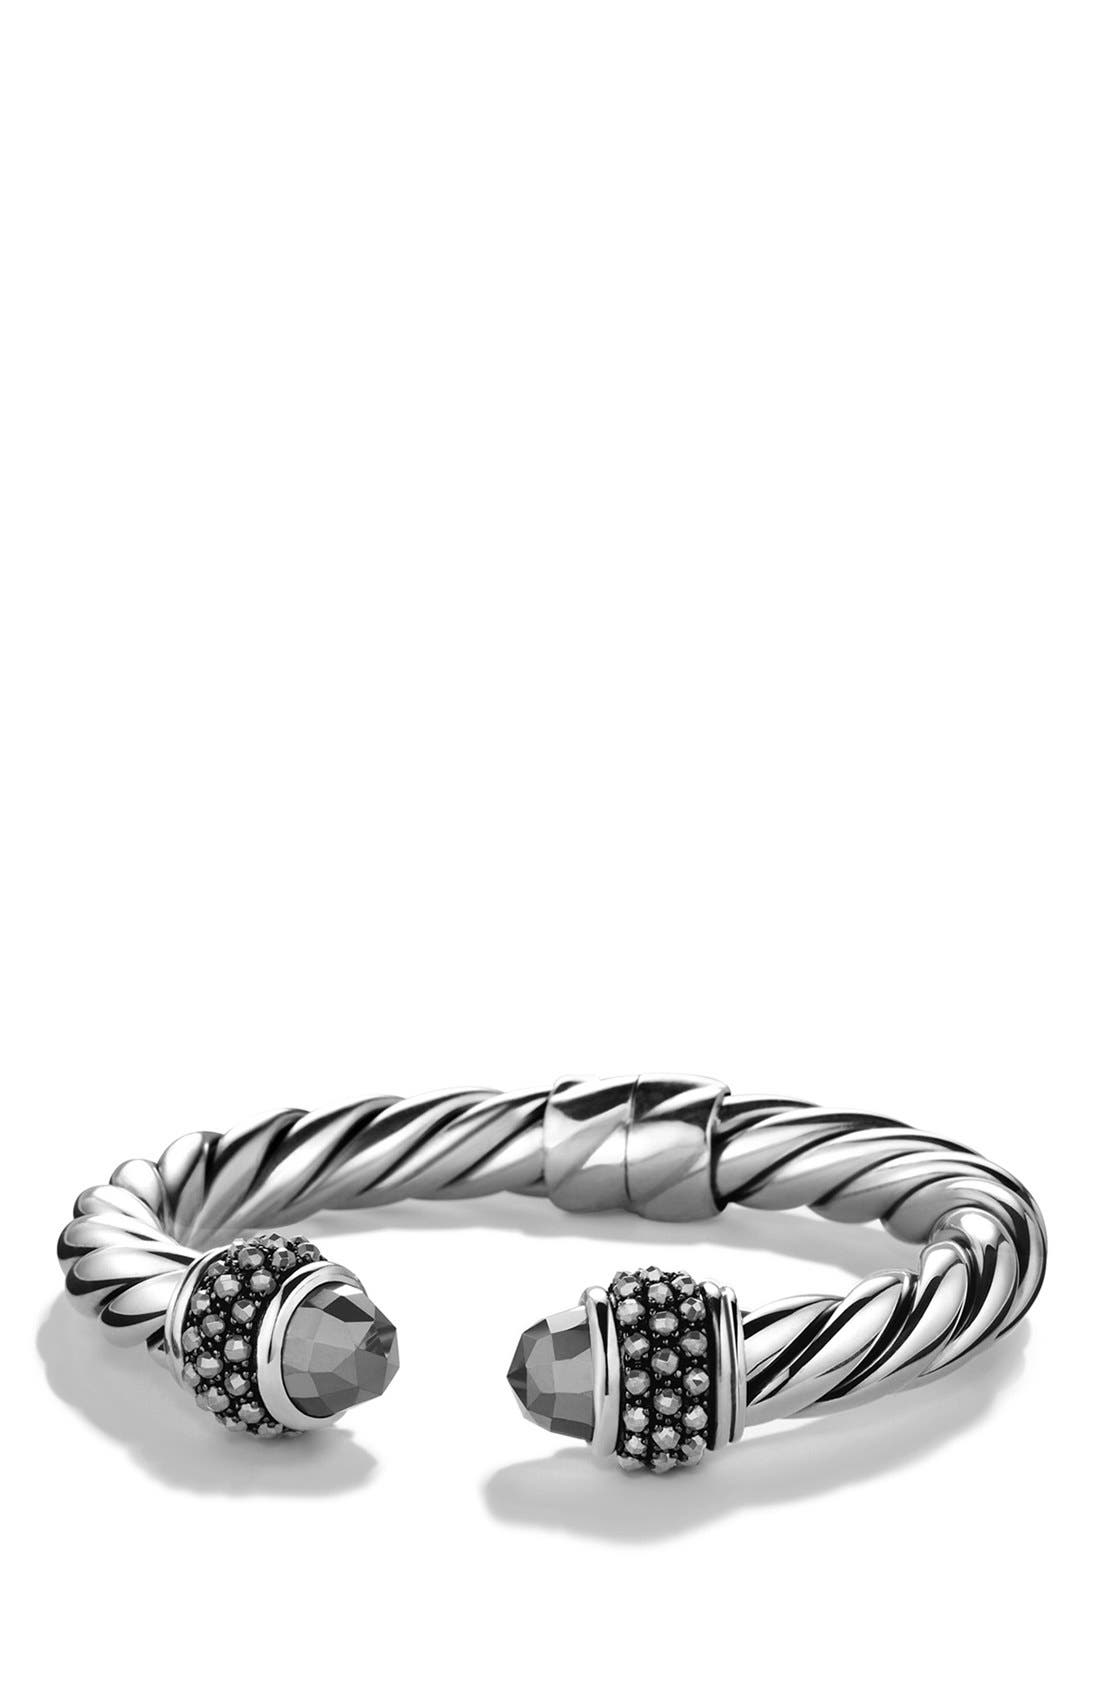 Bracelet with Semiprecious Stones, 10mm,                             Main thumbnail 1, color,                             Hematine